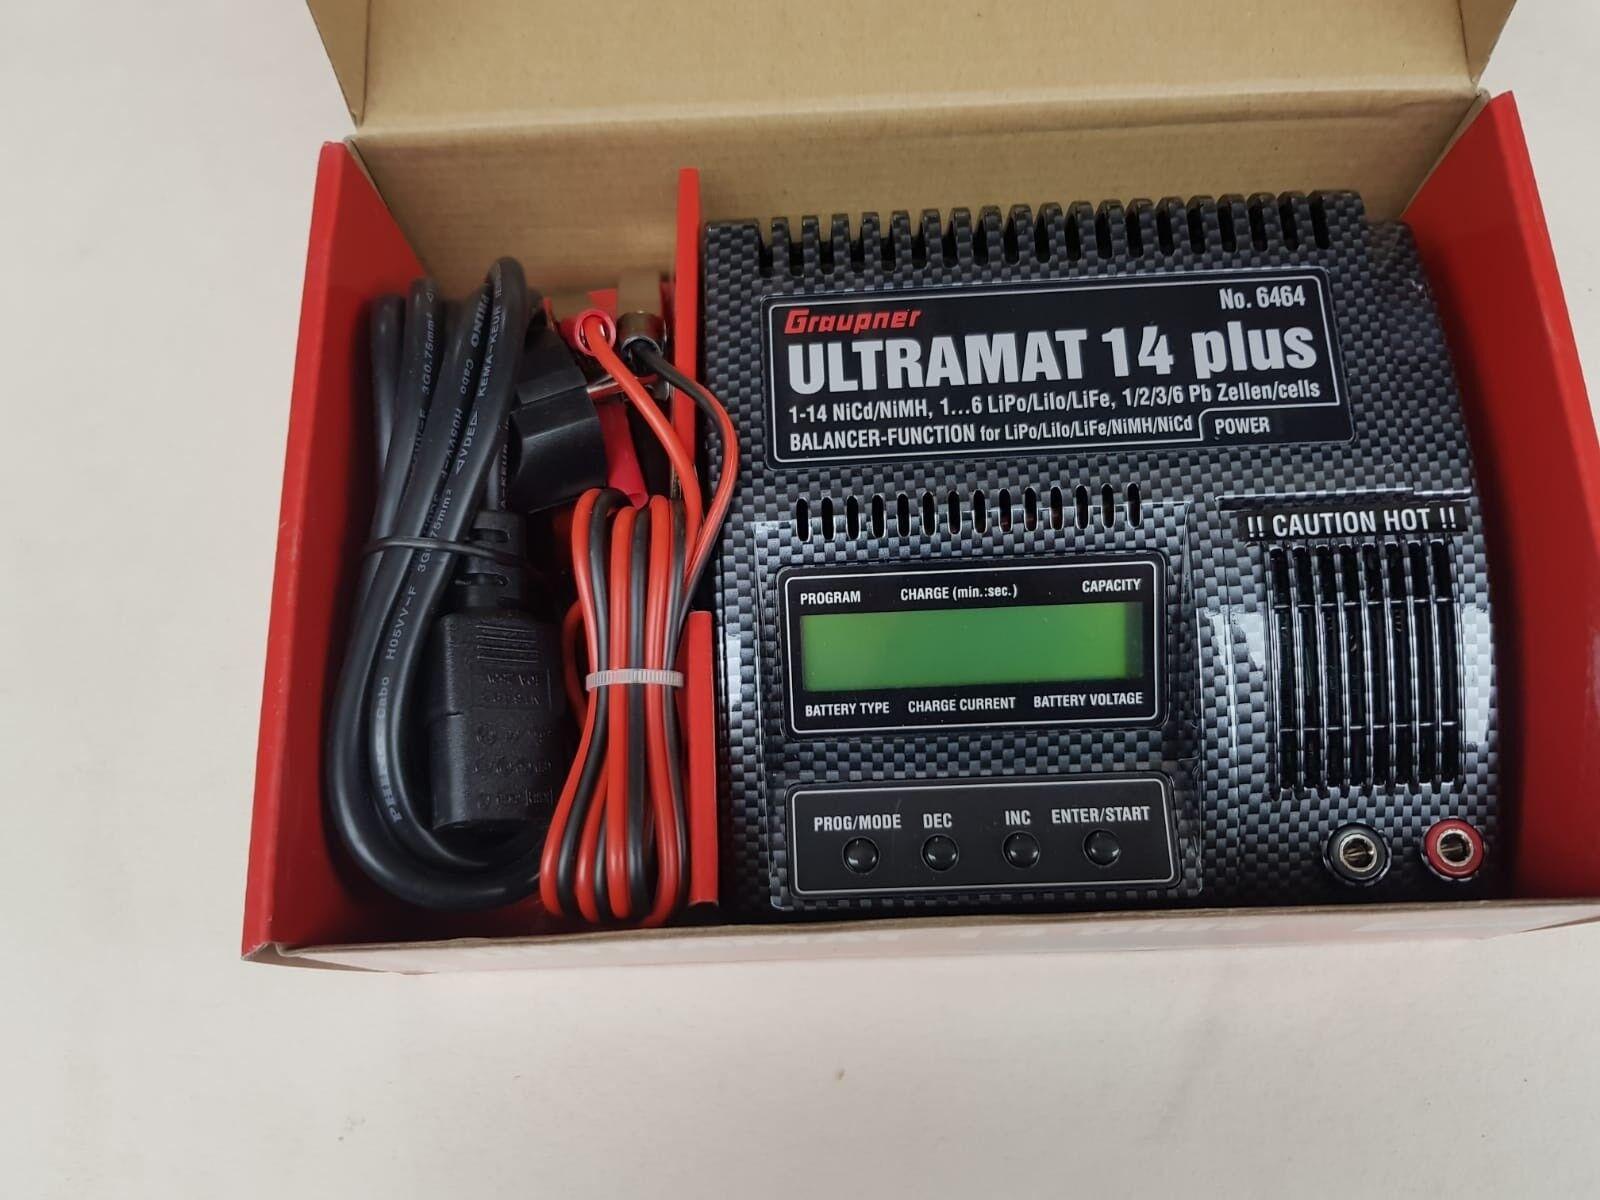 Charger grispner Ultramat 14 plus 6464 FREE SHIPPING